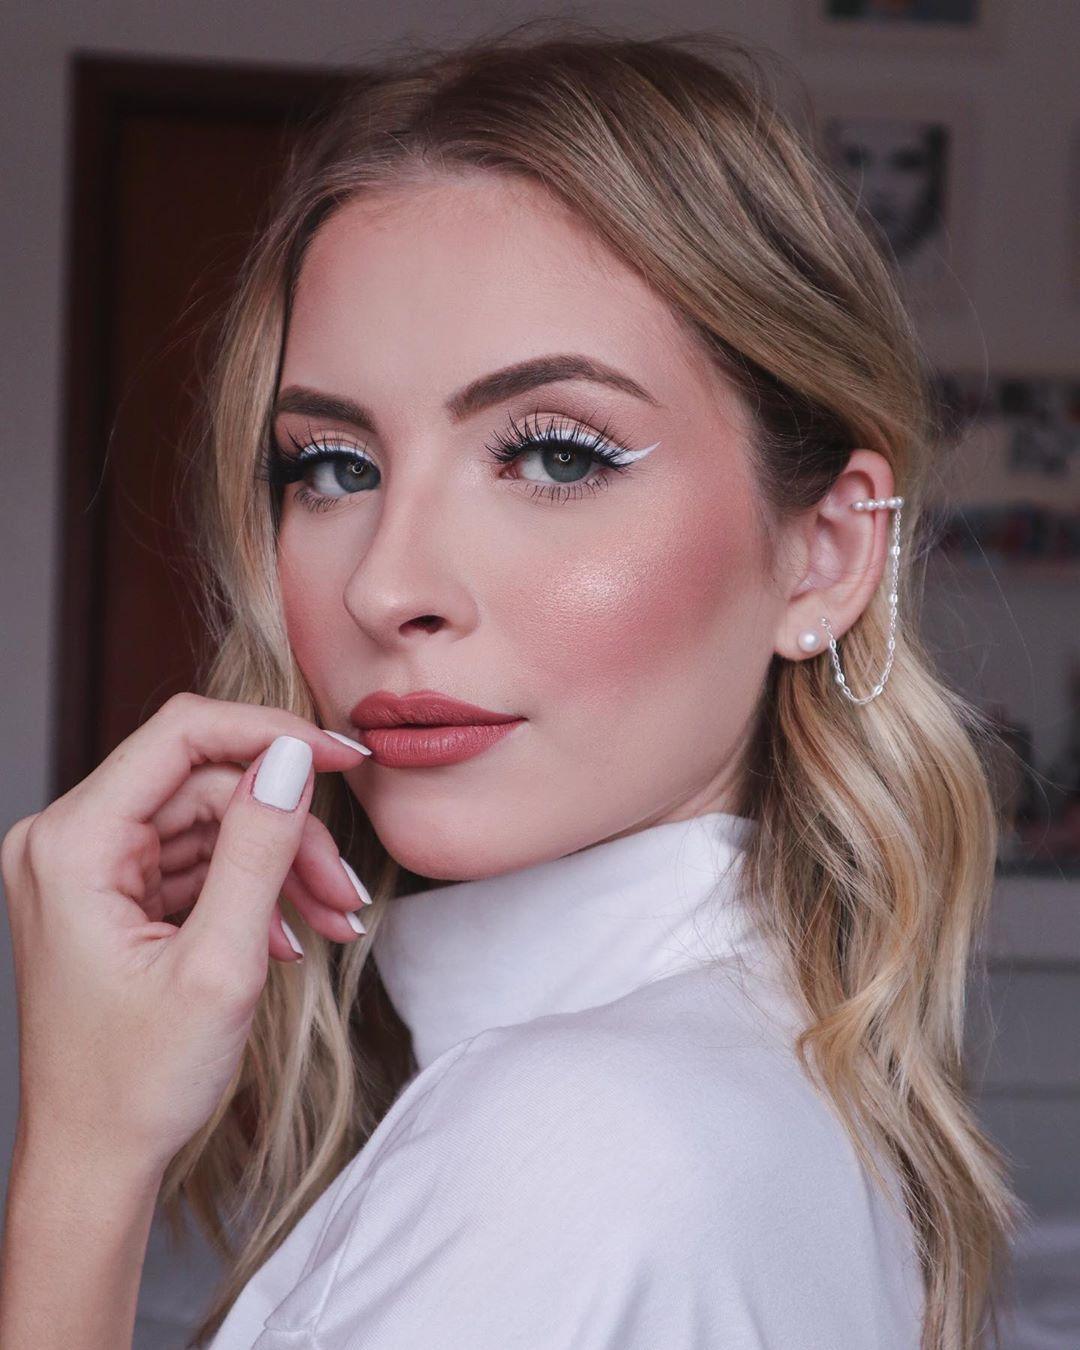 ღ sαℓσмé ∂єsєrτ ღ | American makeup, Hair beauty, Makeup looks